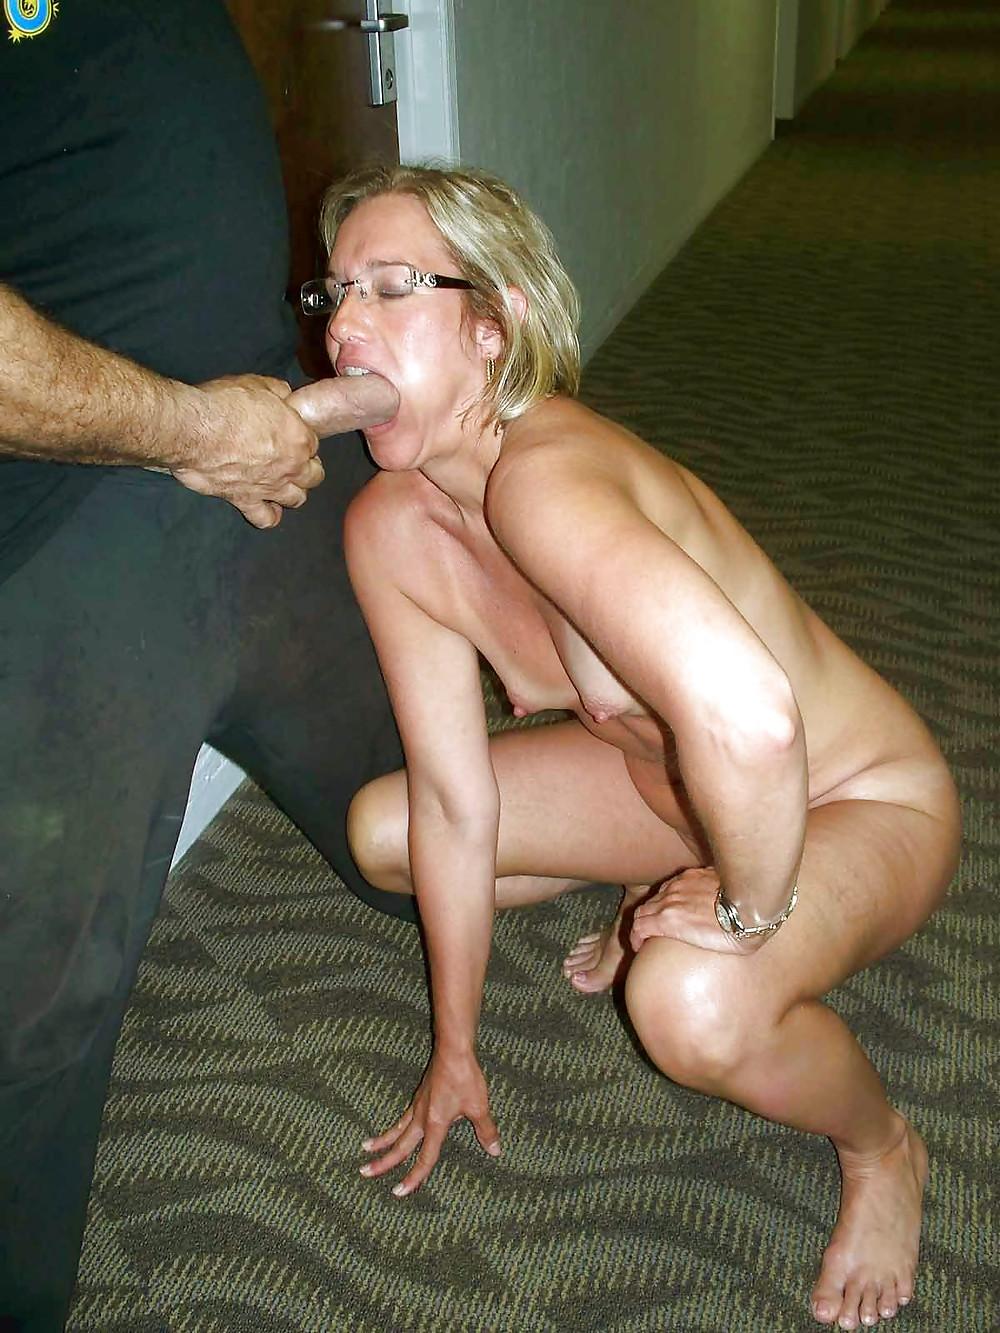 Sexy mature women, nude older ladies, amateur mature porn